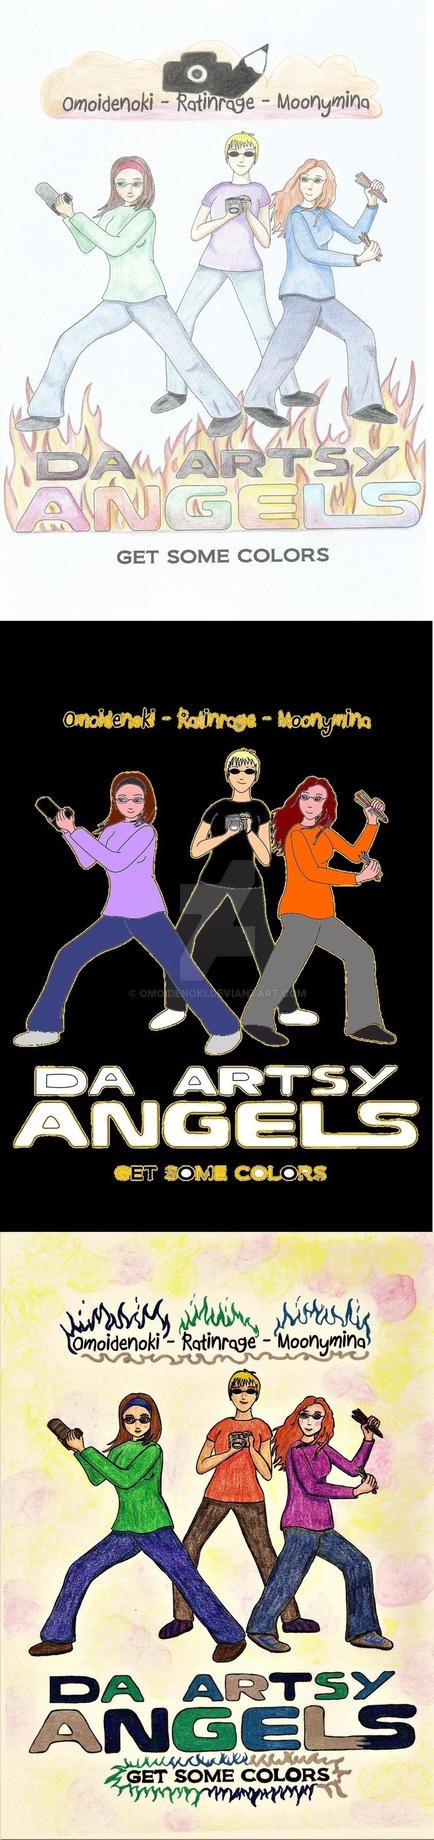 ARTSYs Angels Collab by Omoidenoki